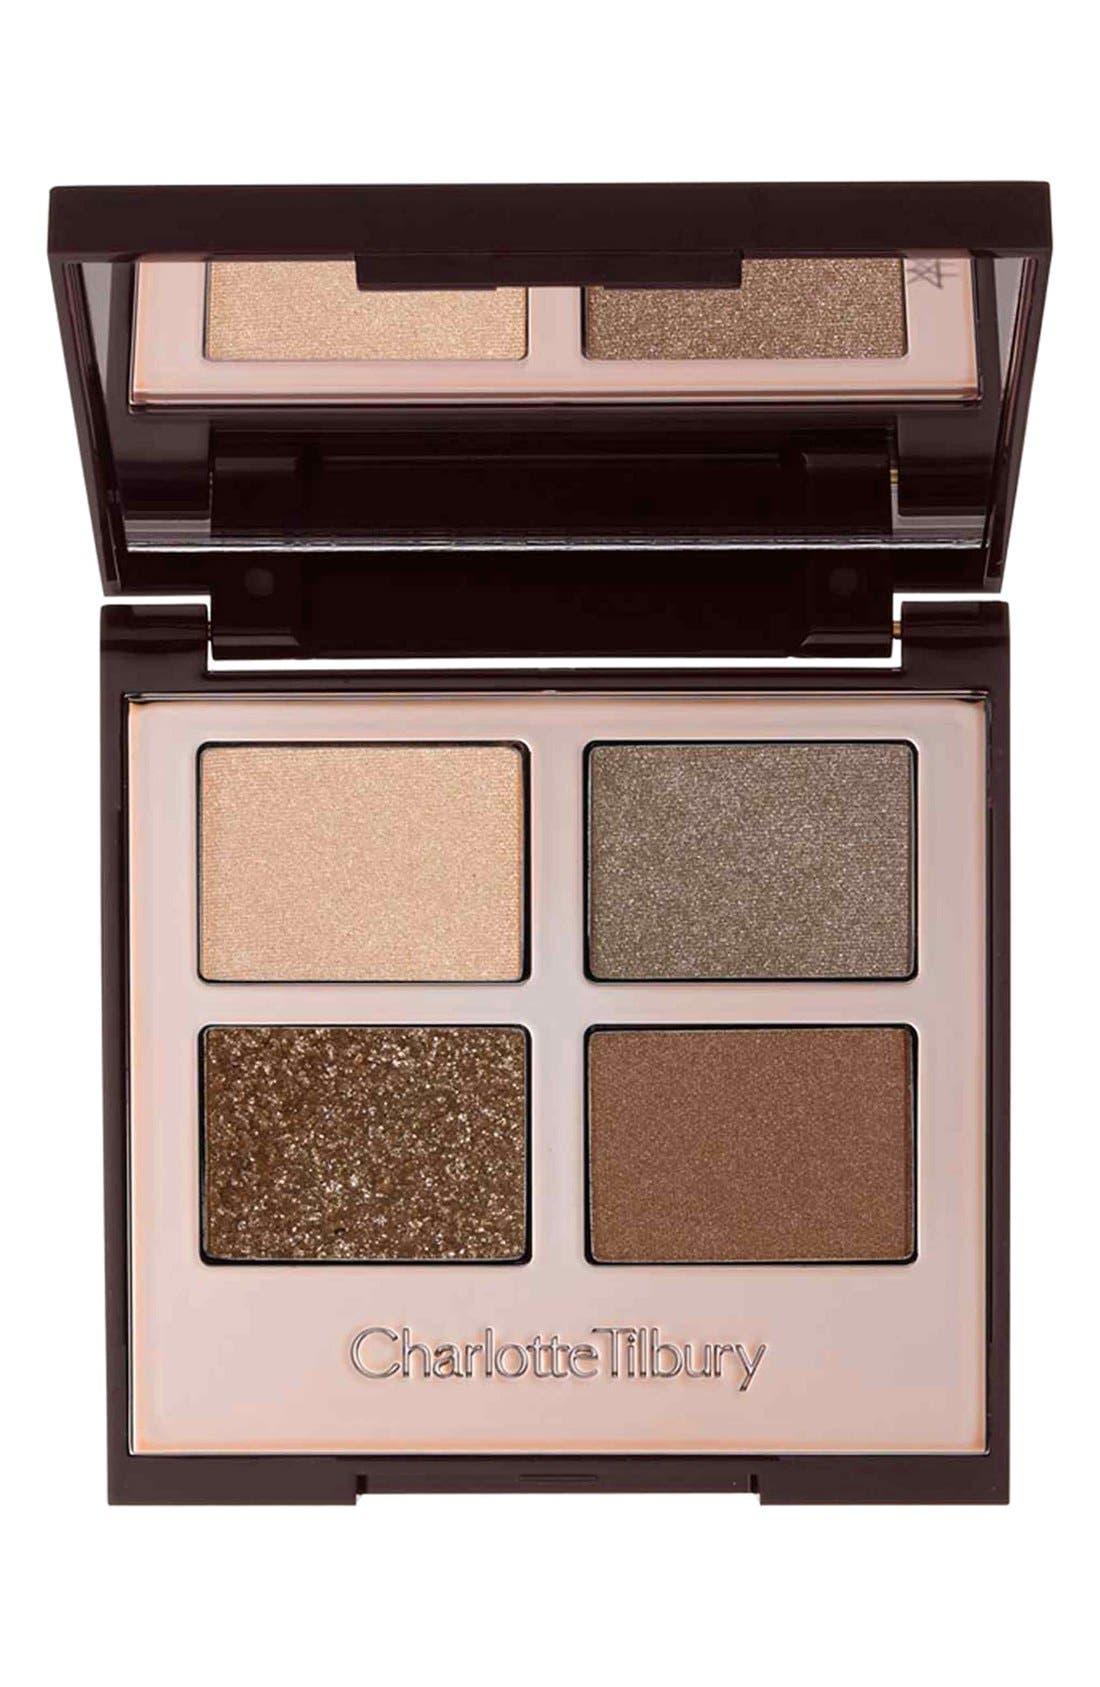 Charlotte Tilbury 'Luxury Palette' Colour-Coded Eyeshadow Palette